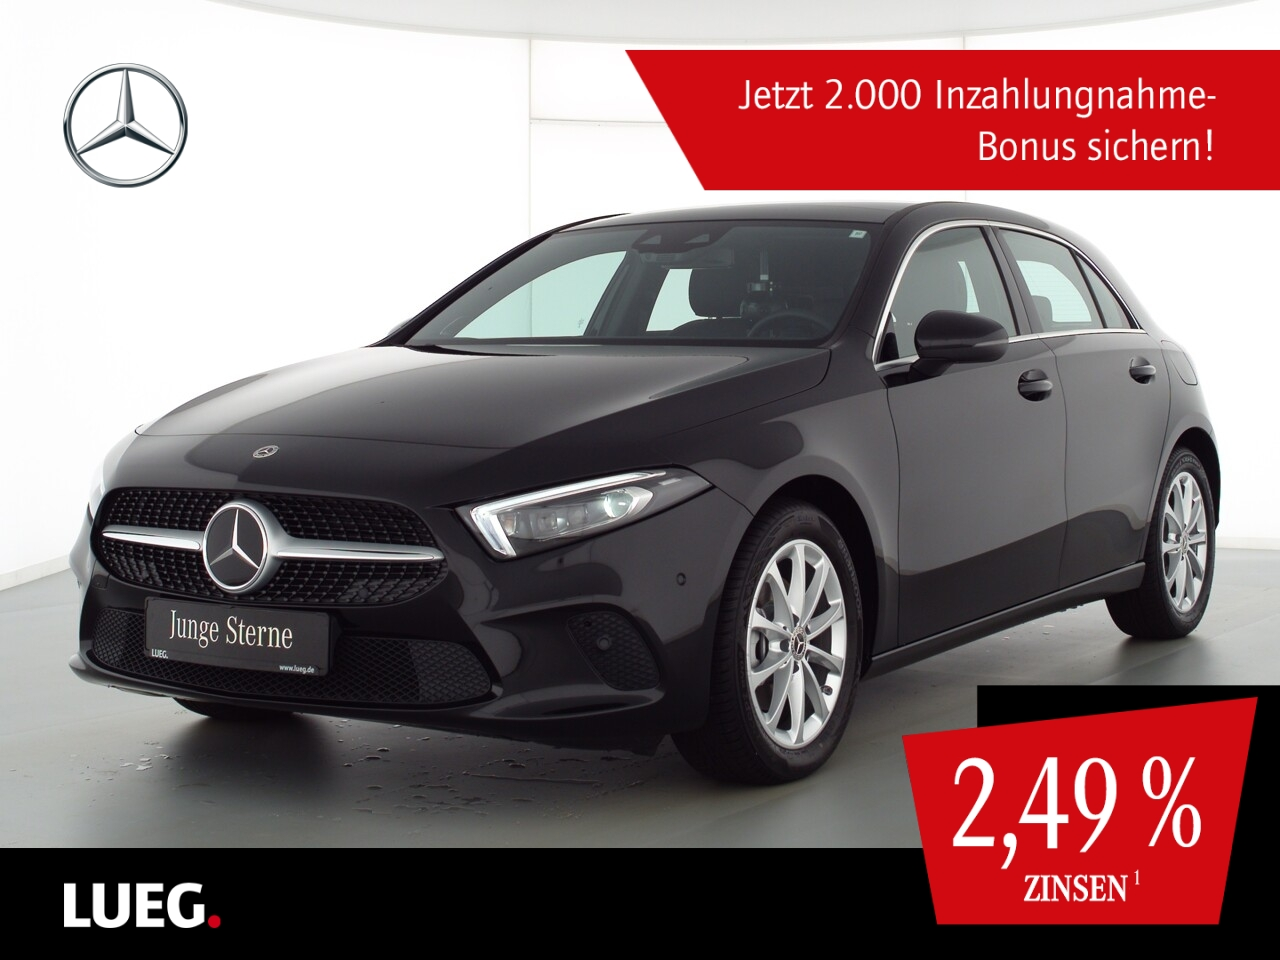 Mercedes-Benz A 180 d Progressive+MBUXHighEnd+PanoD+Mbeam+Burm, Jahr 2020, Diesel